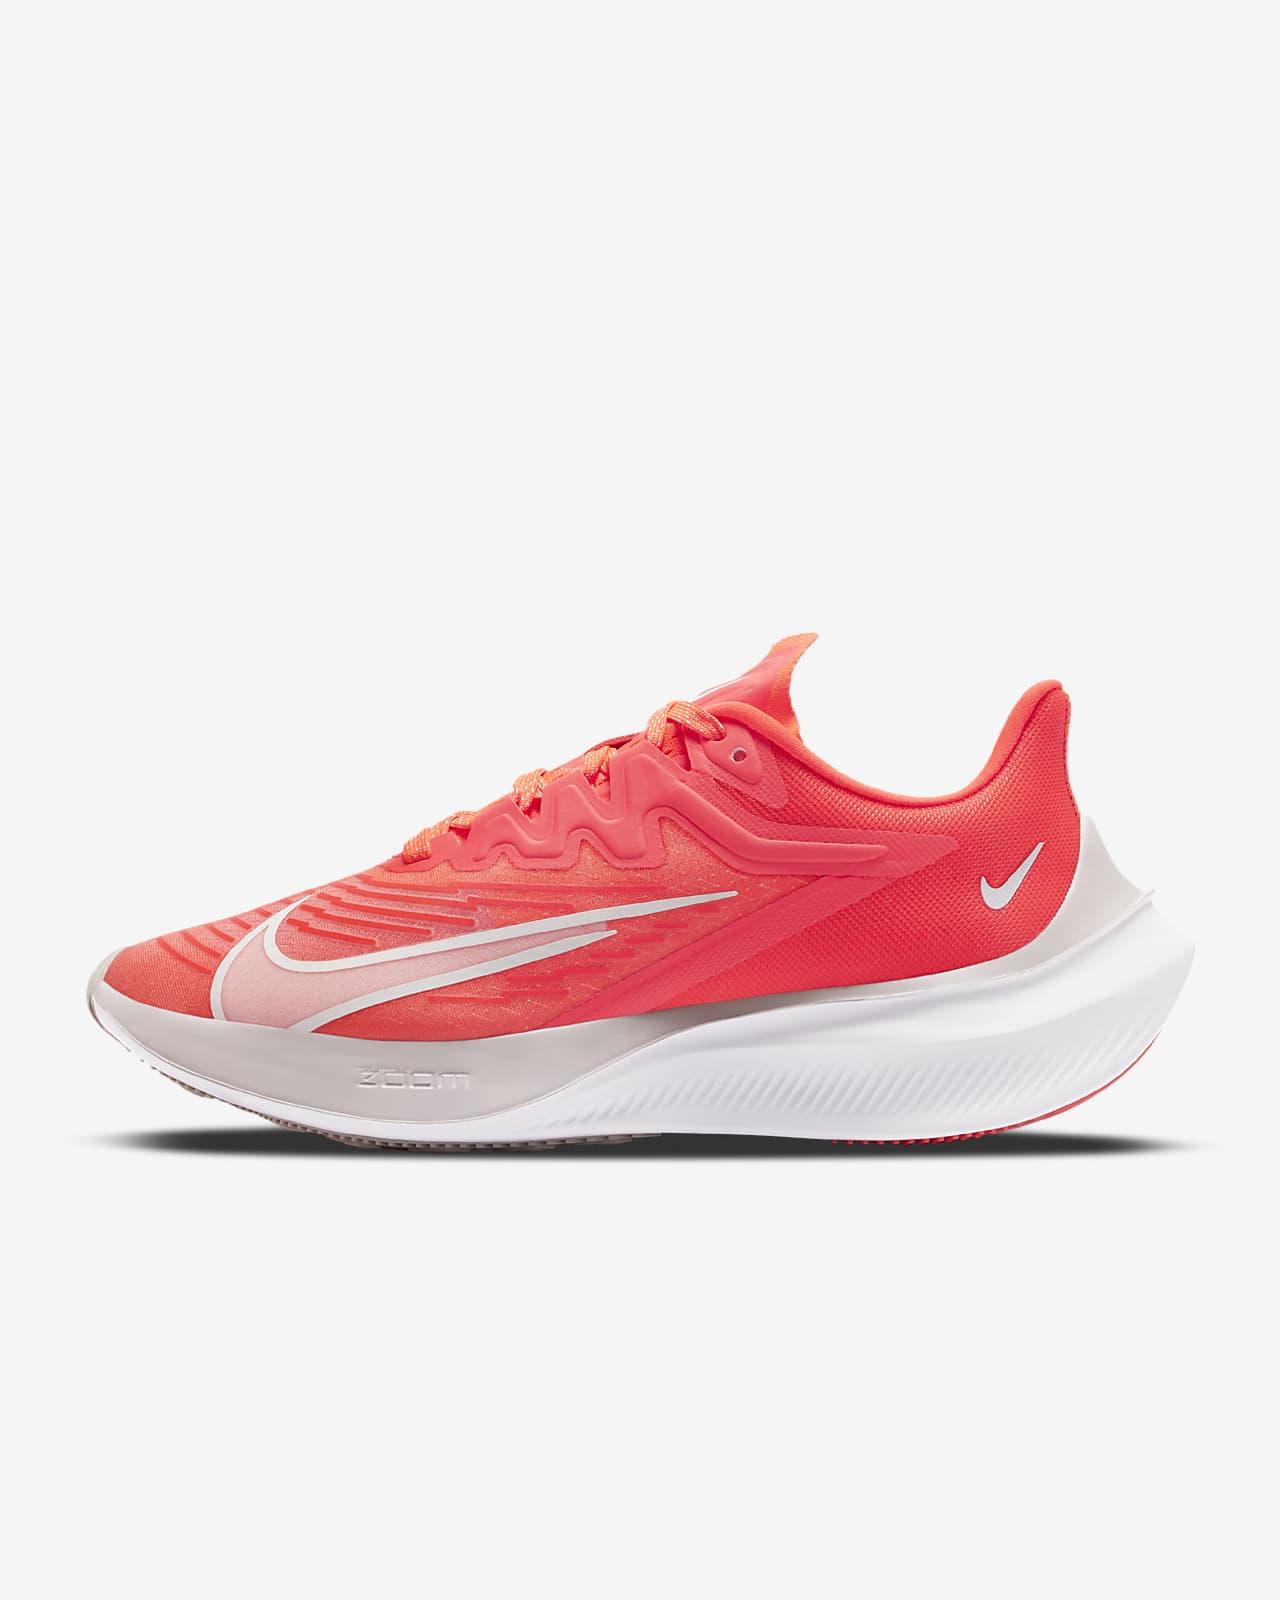 Nike Zoom Gravity 2 女款跑鞋